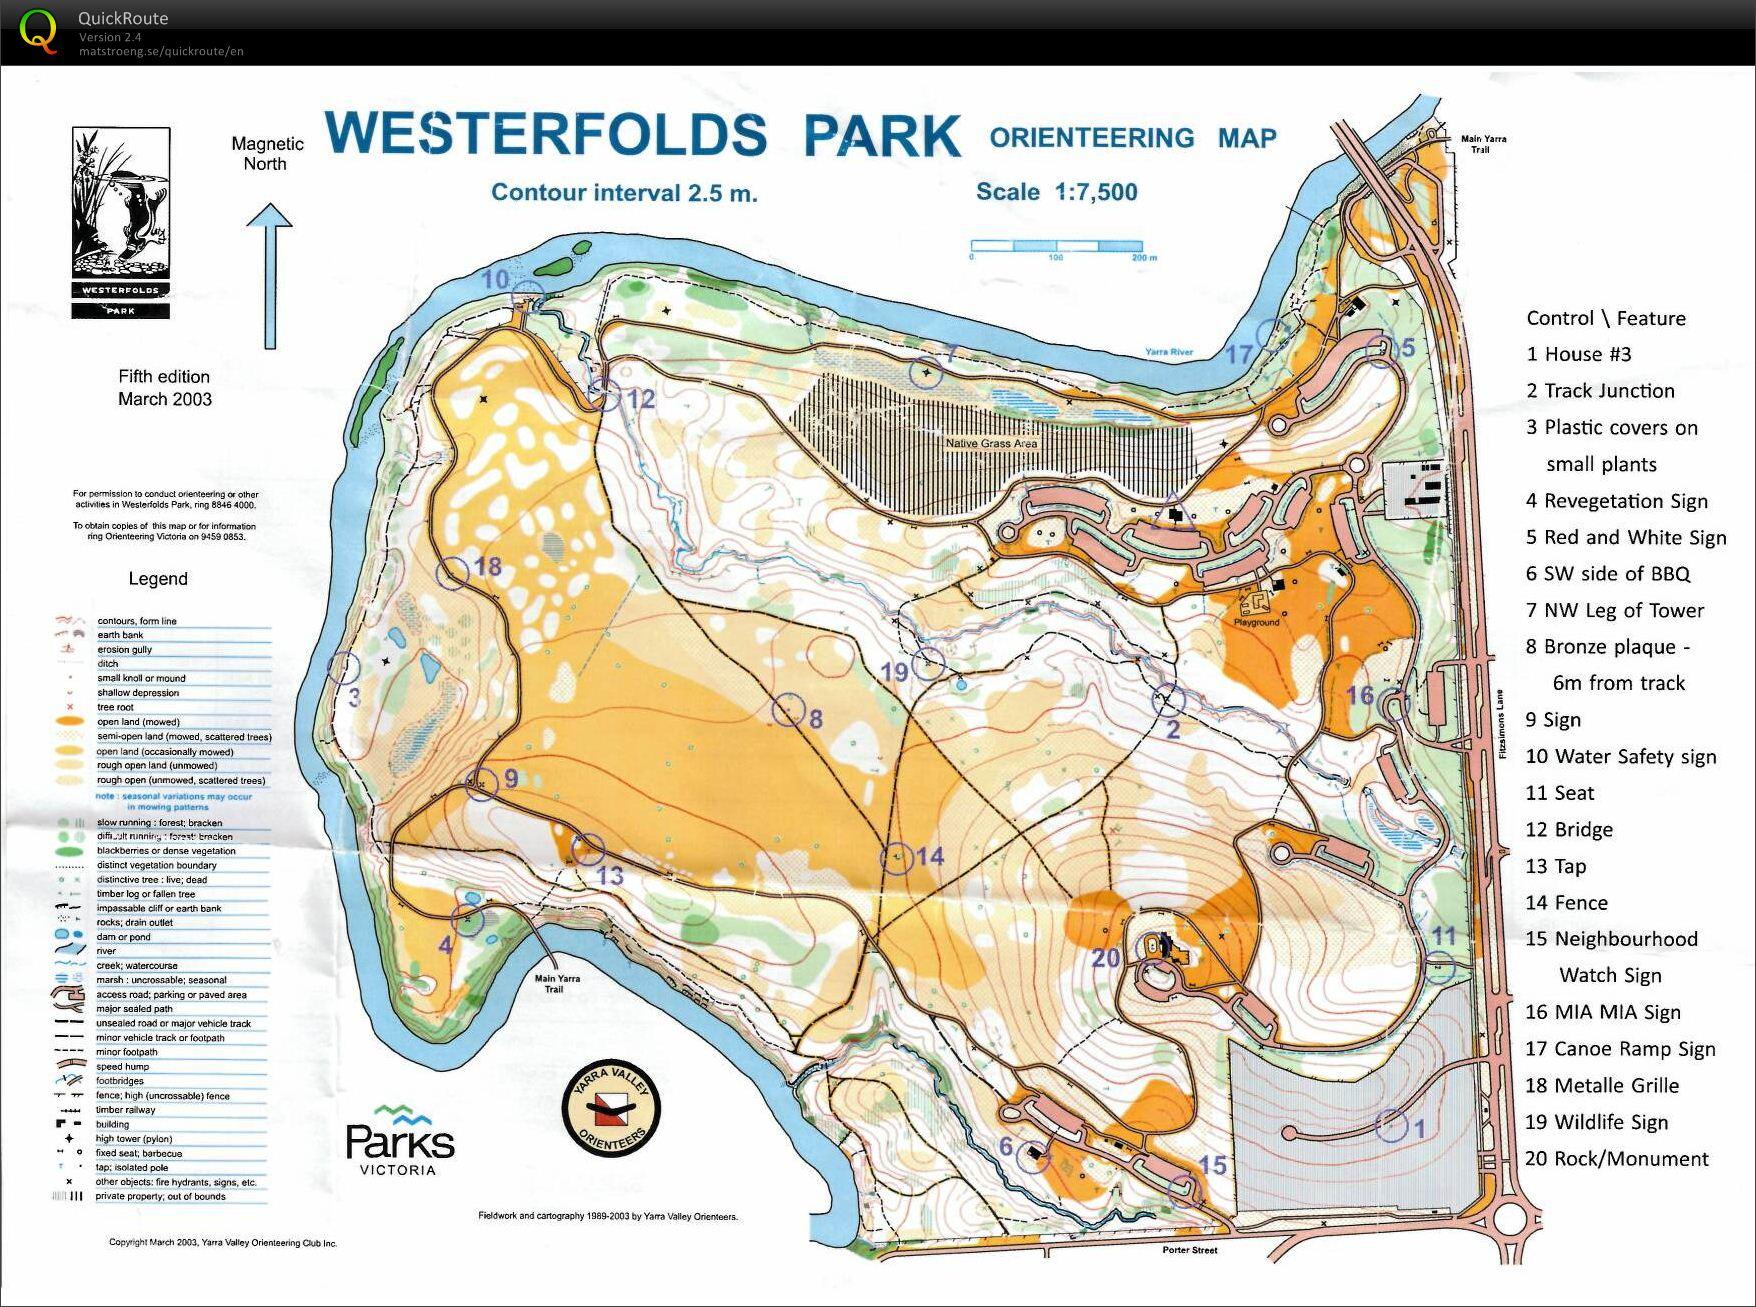 Bruce's digital orienteering map archive :: 2013 Saturday Series Event ...